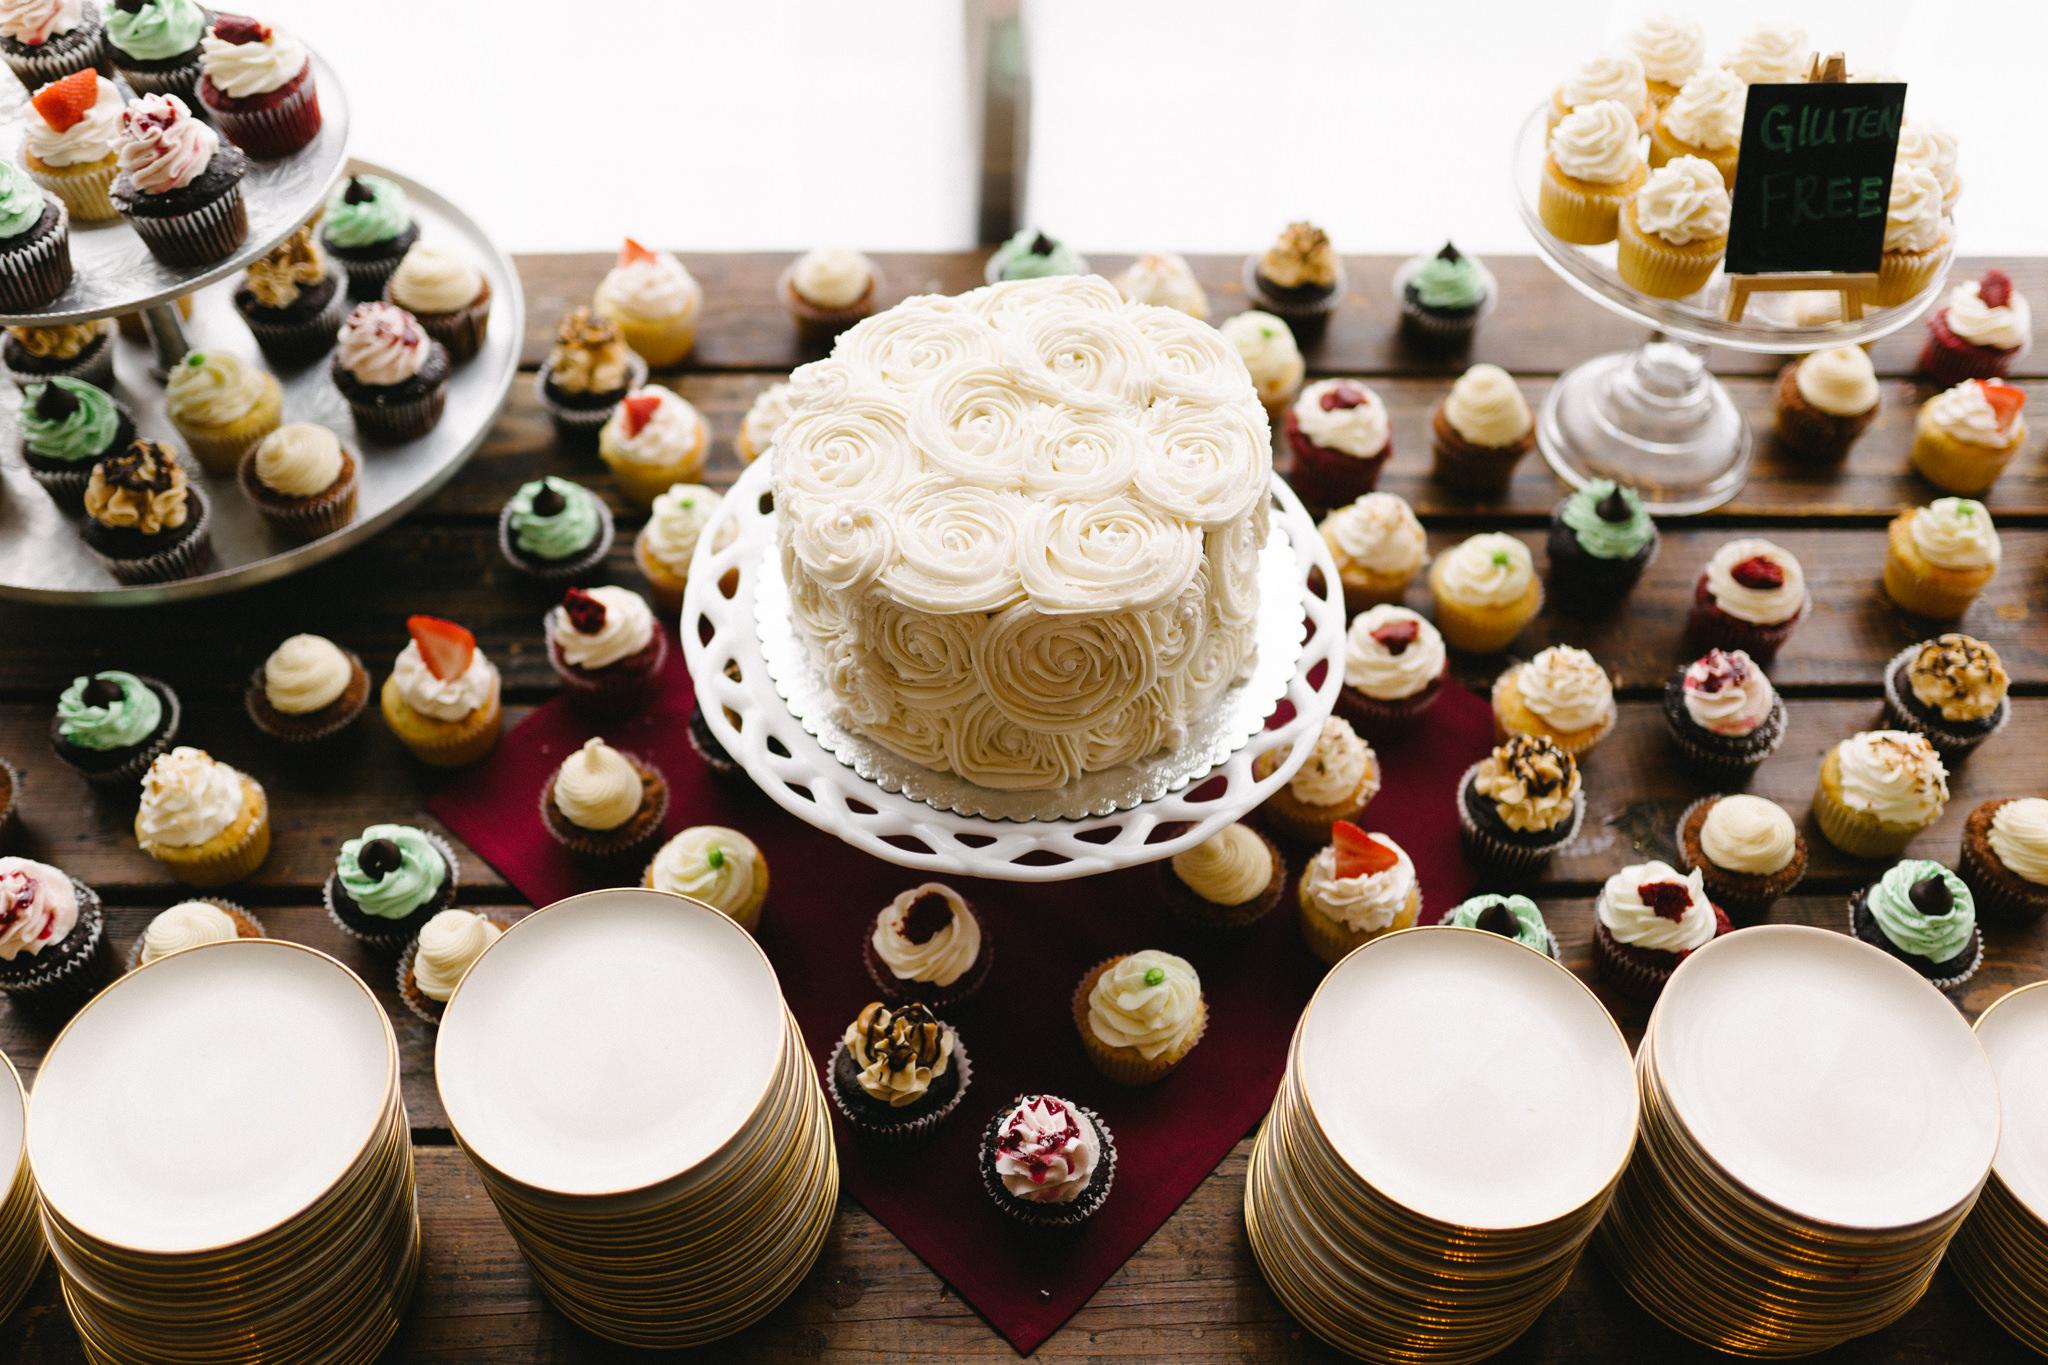 038-rempel-photography-chicago-wedding-inspiration-susan-daniel-michigan-metro-detroit-christian-church-holly-vault-cupcakes-and-kisses.jpg